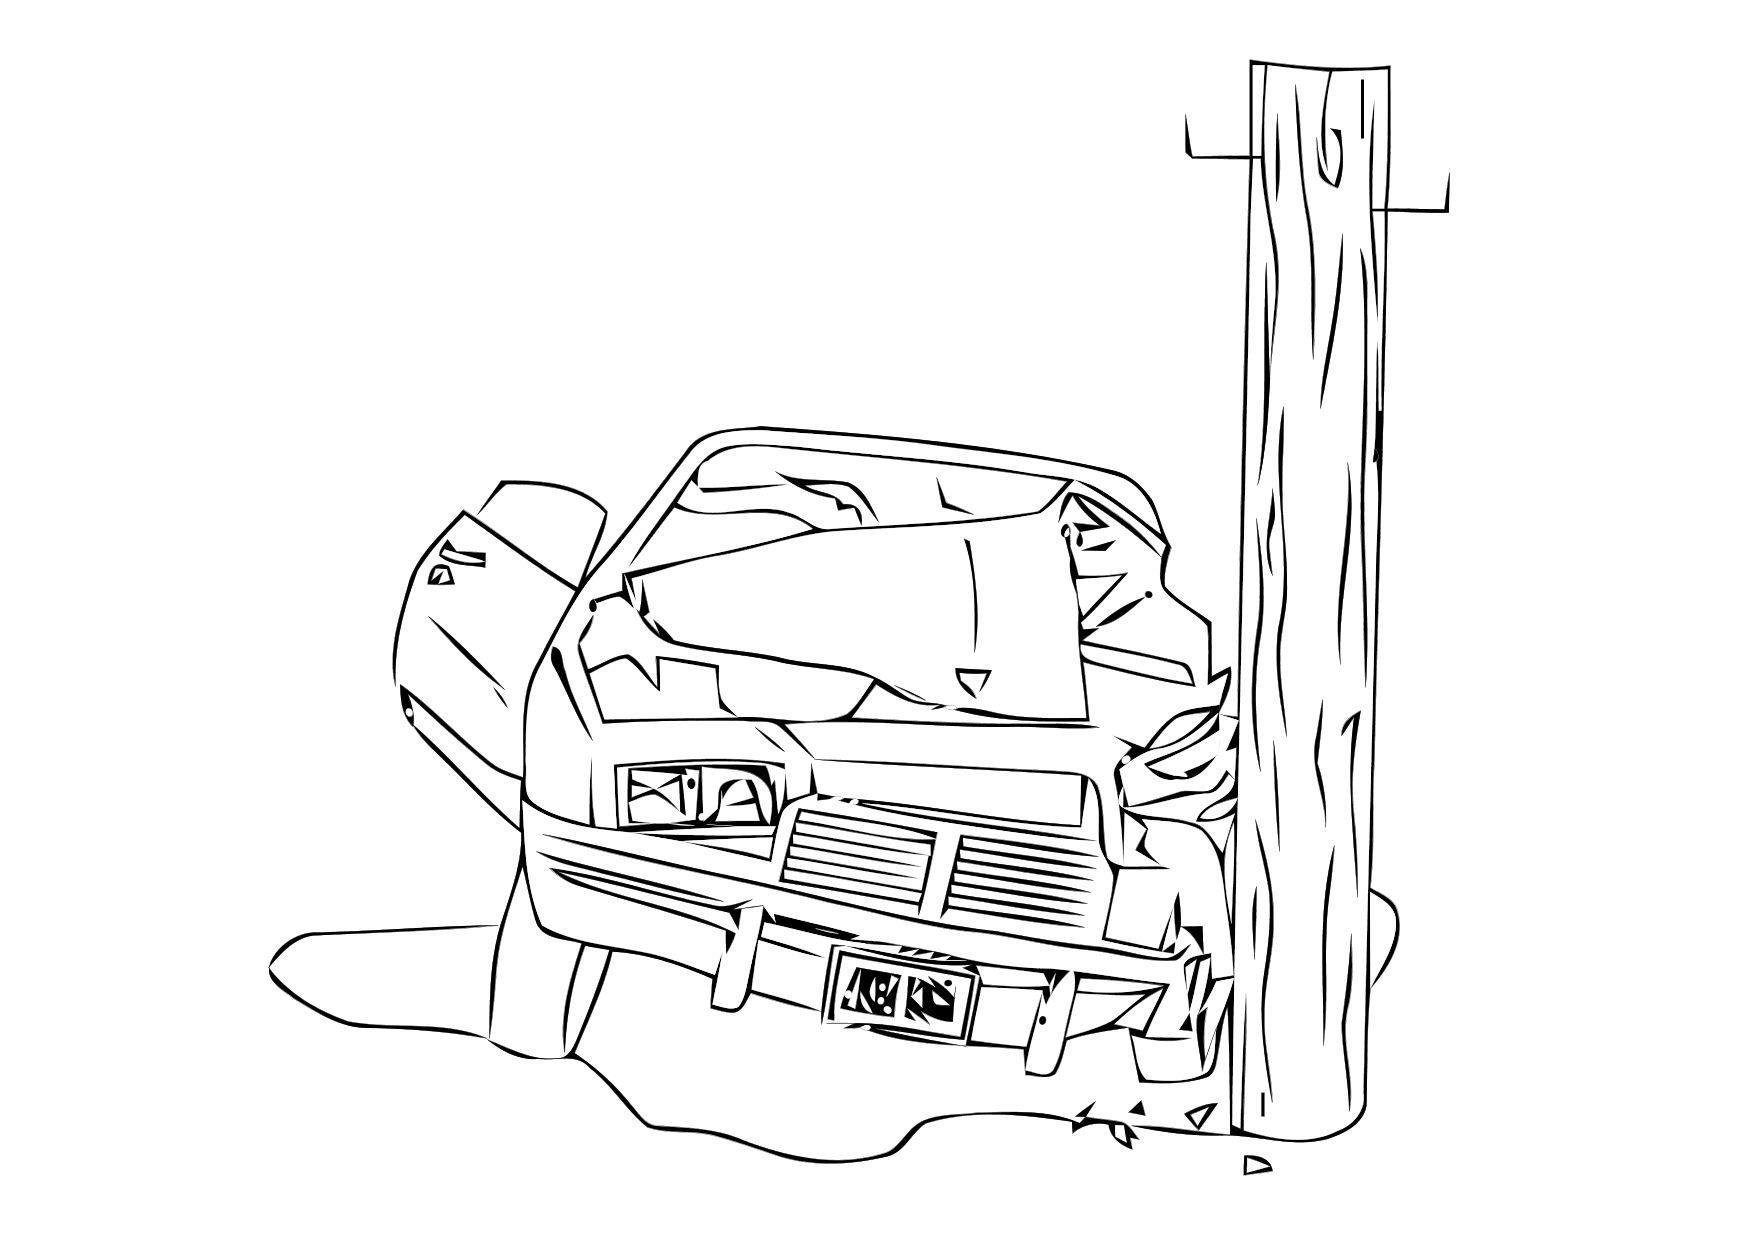 Dibujo para colorear Choque - accidente - Img 11308